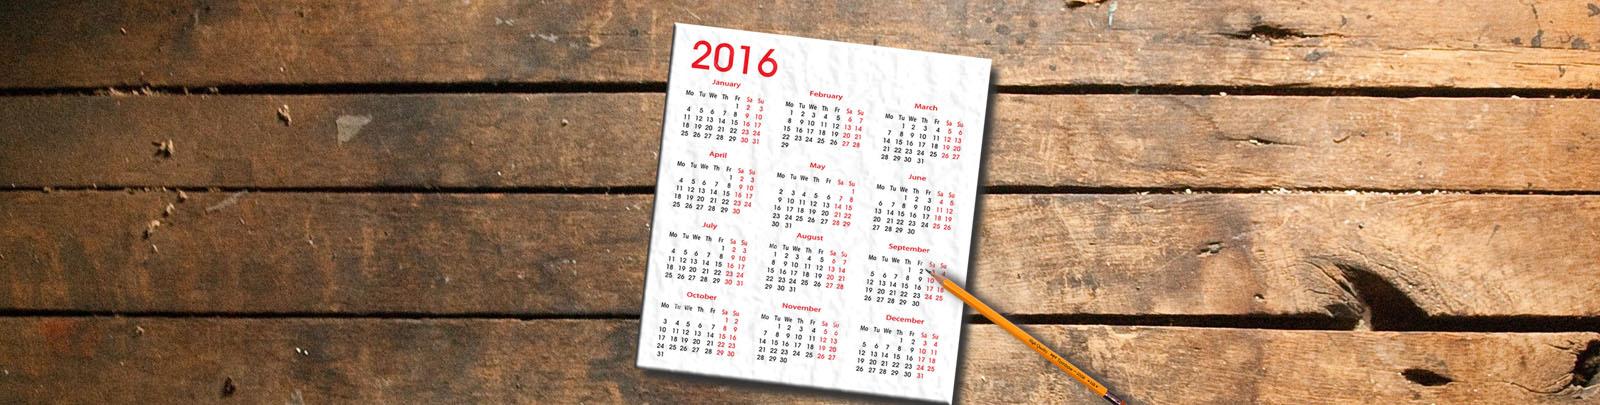 calendrier_bois